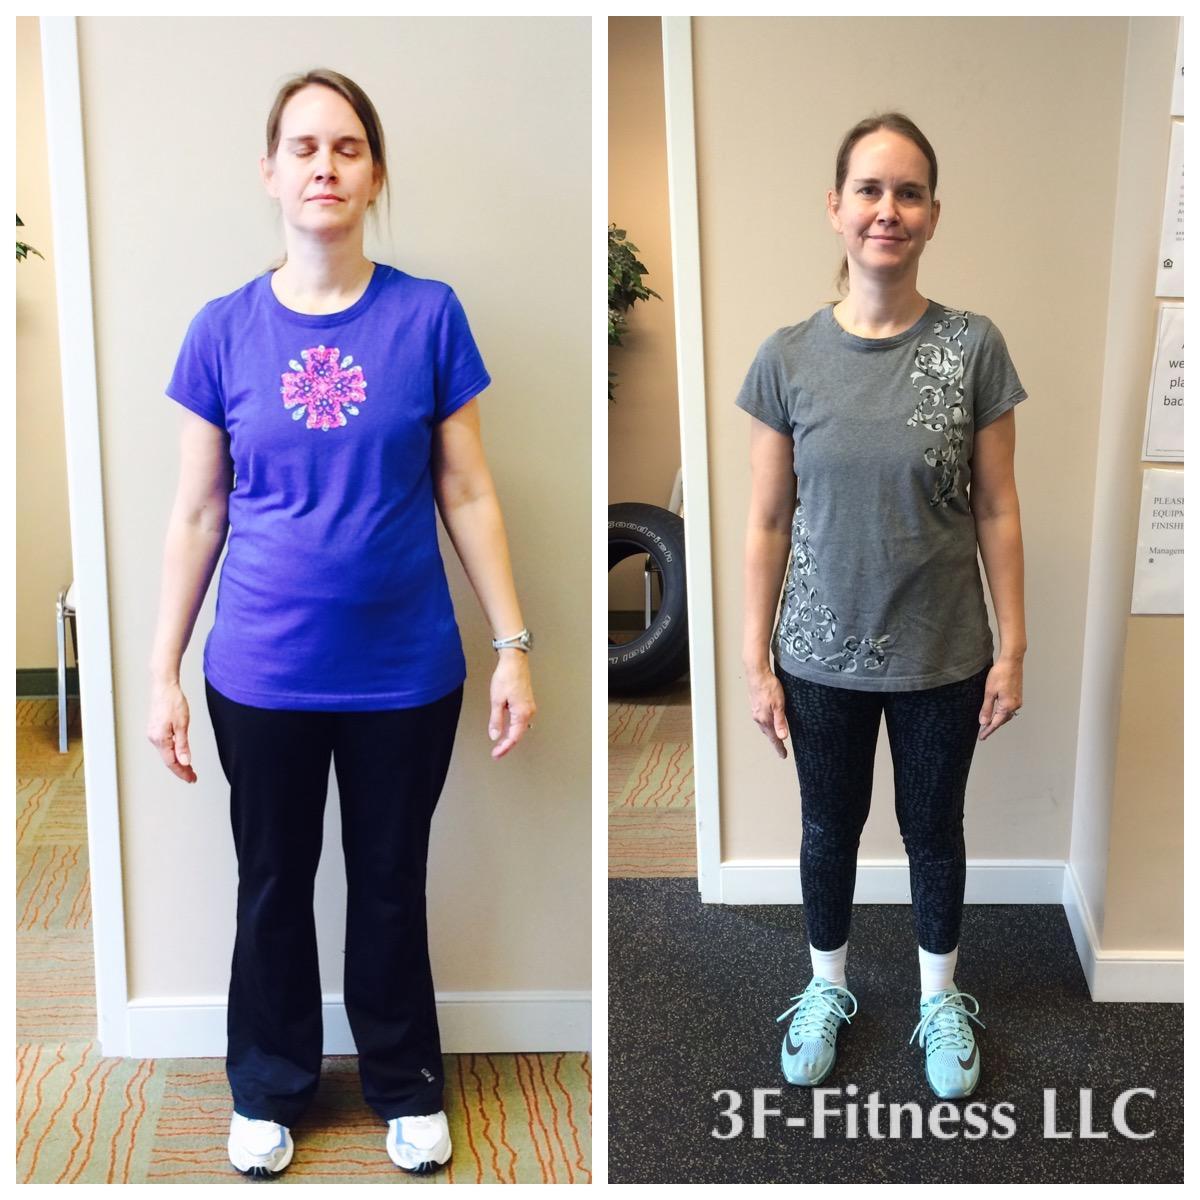 3F-Fitness LLC image 1